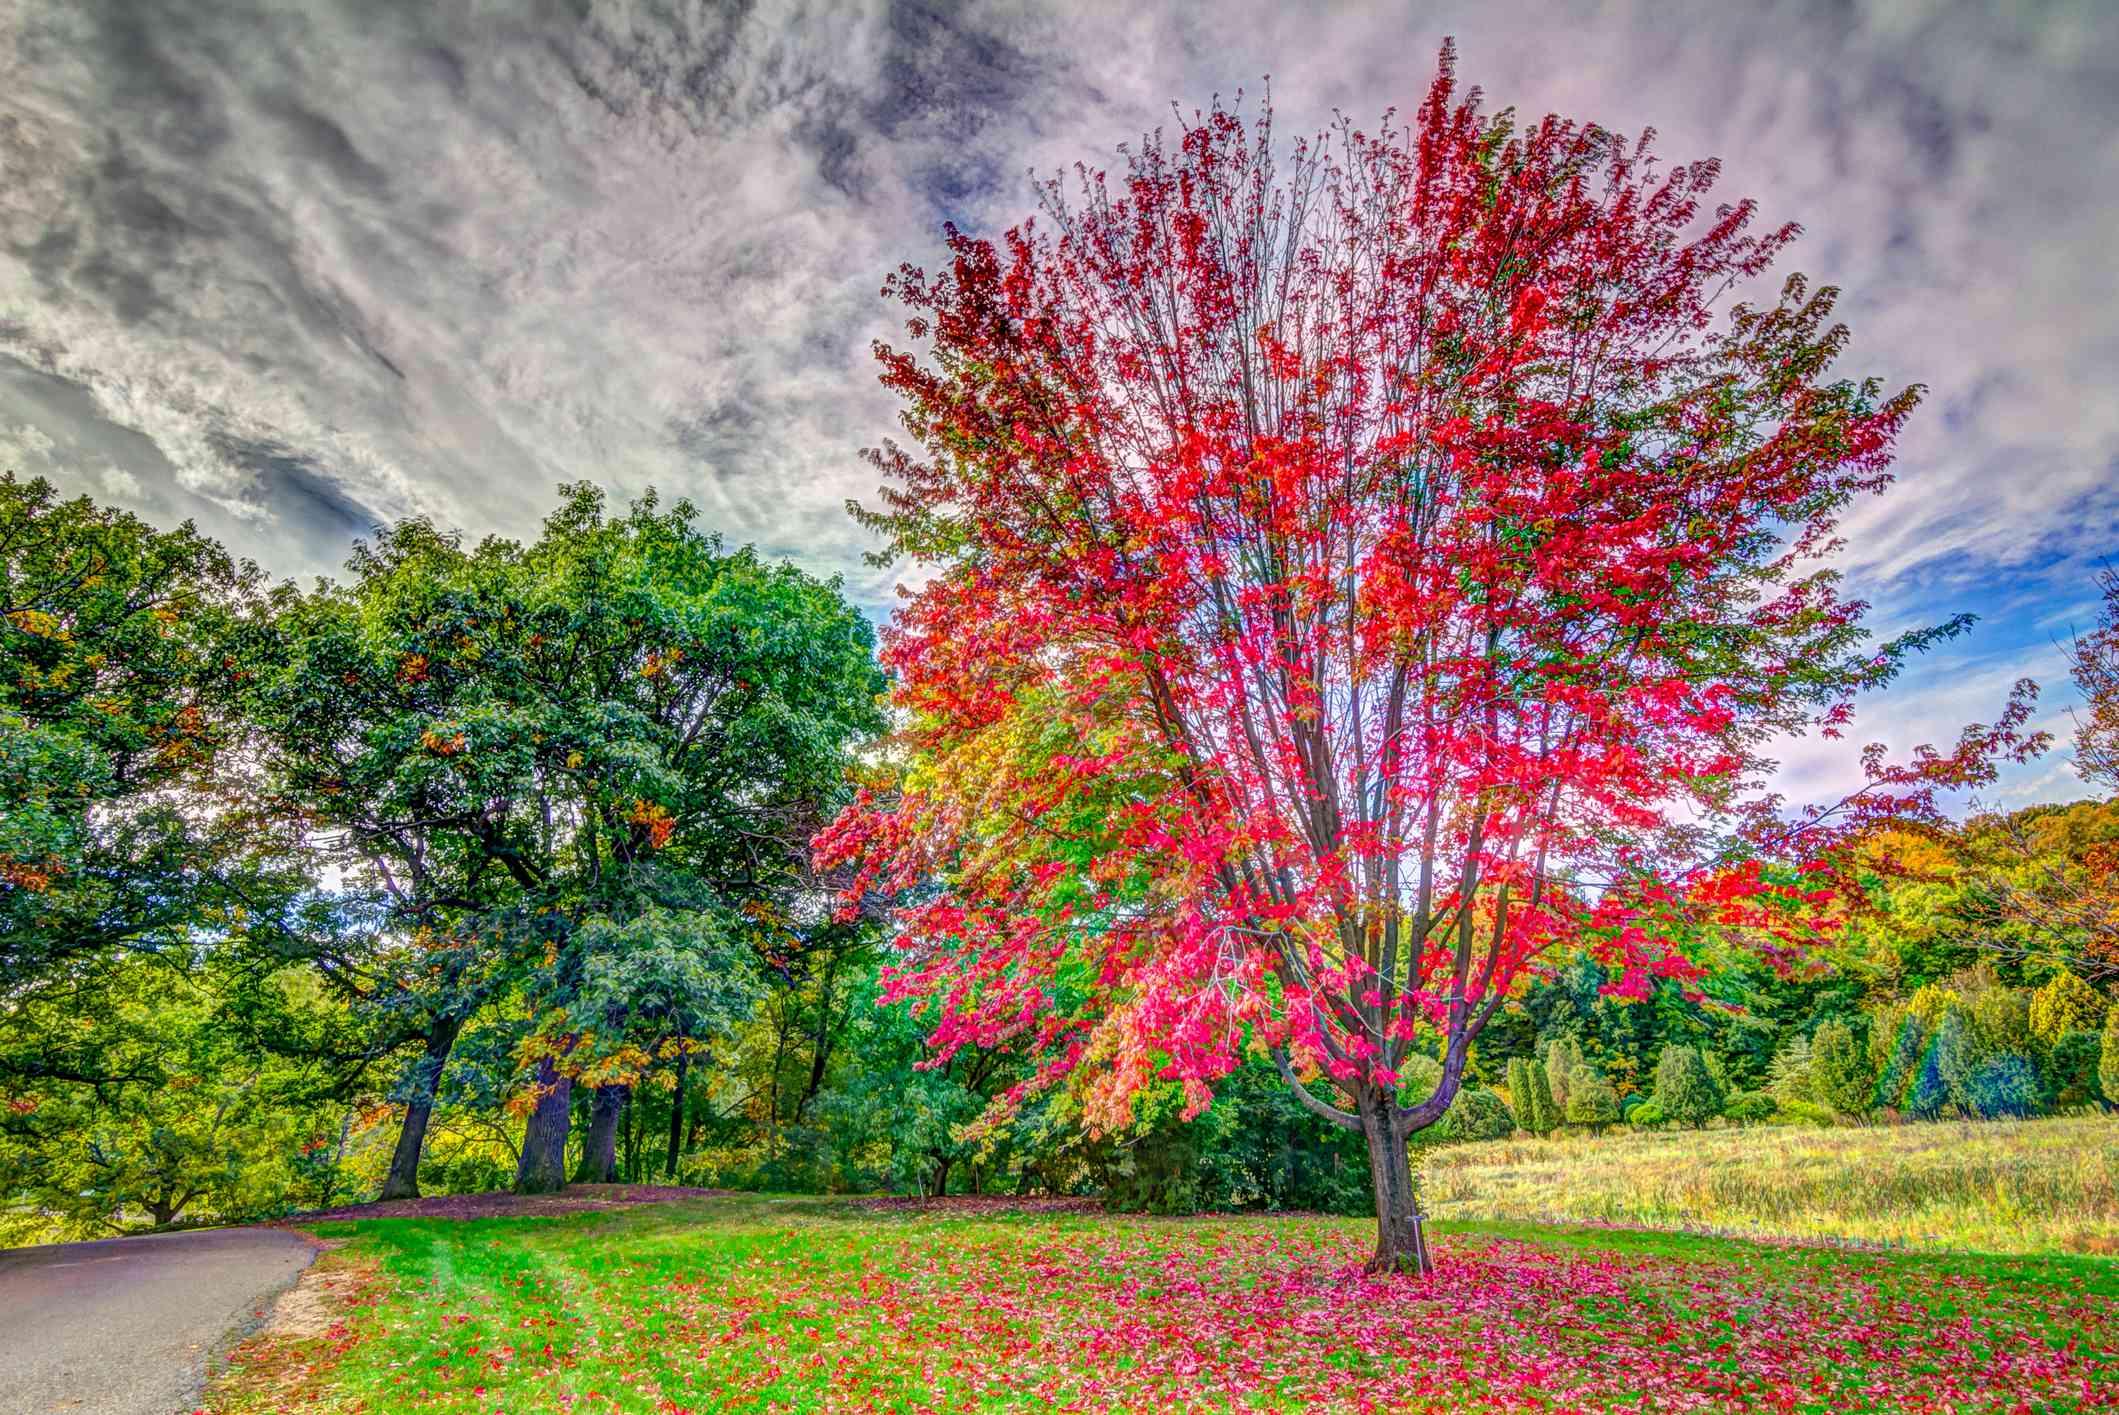 Fall Color at Minnesota Landscape Arboretum